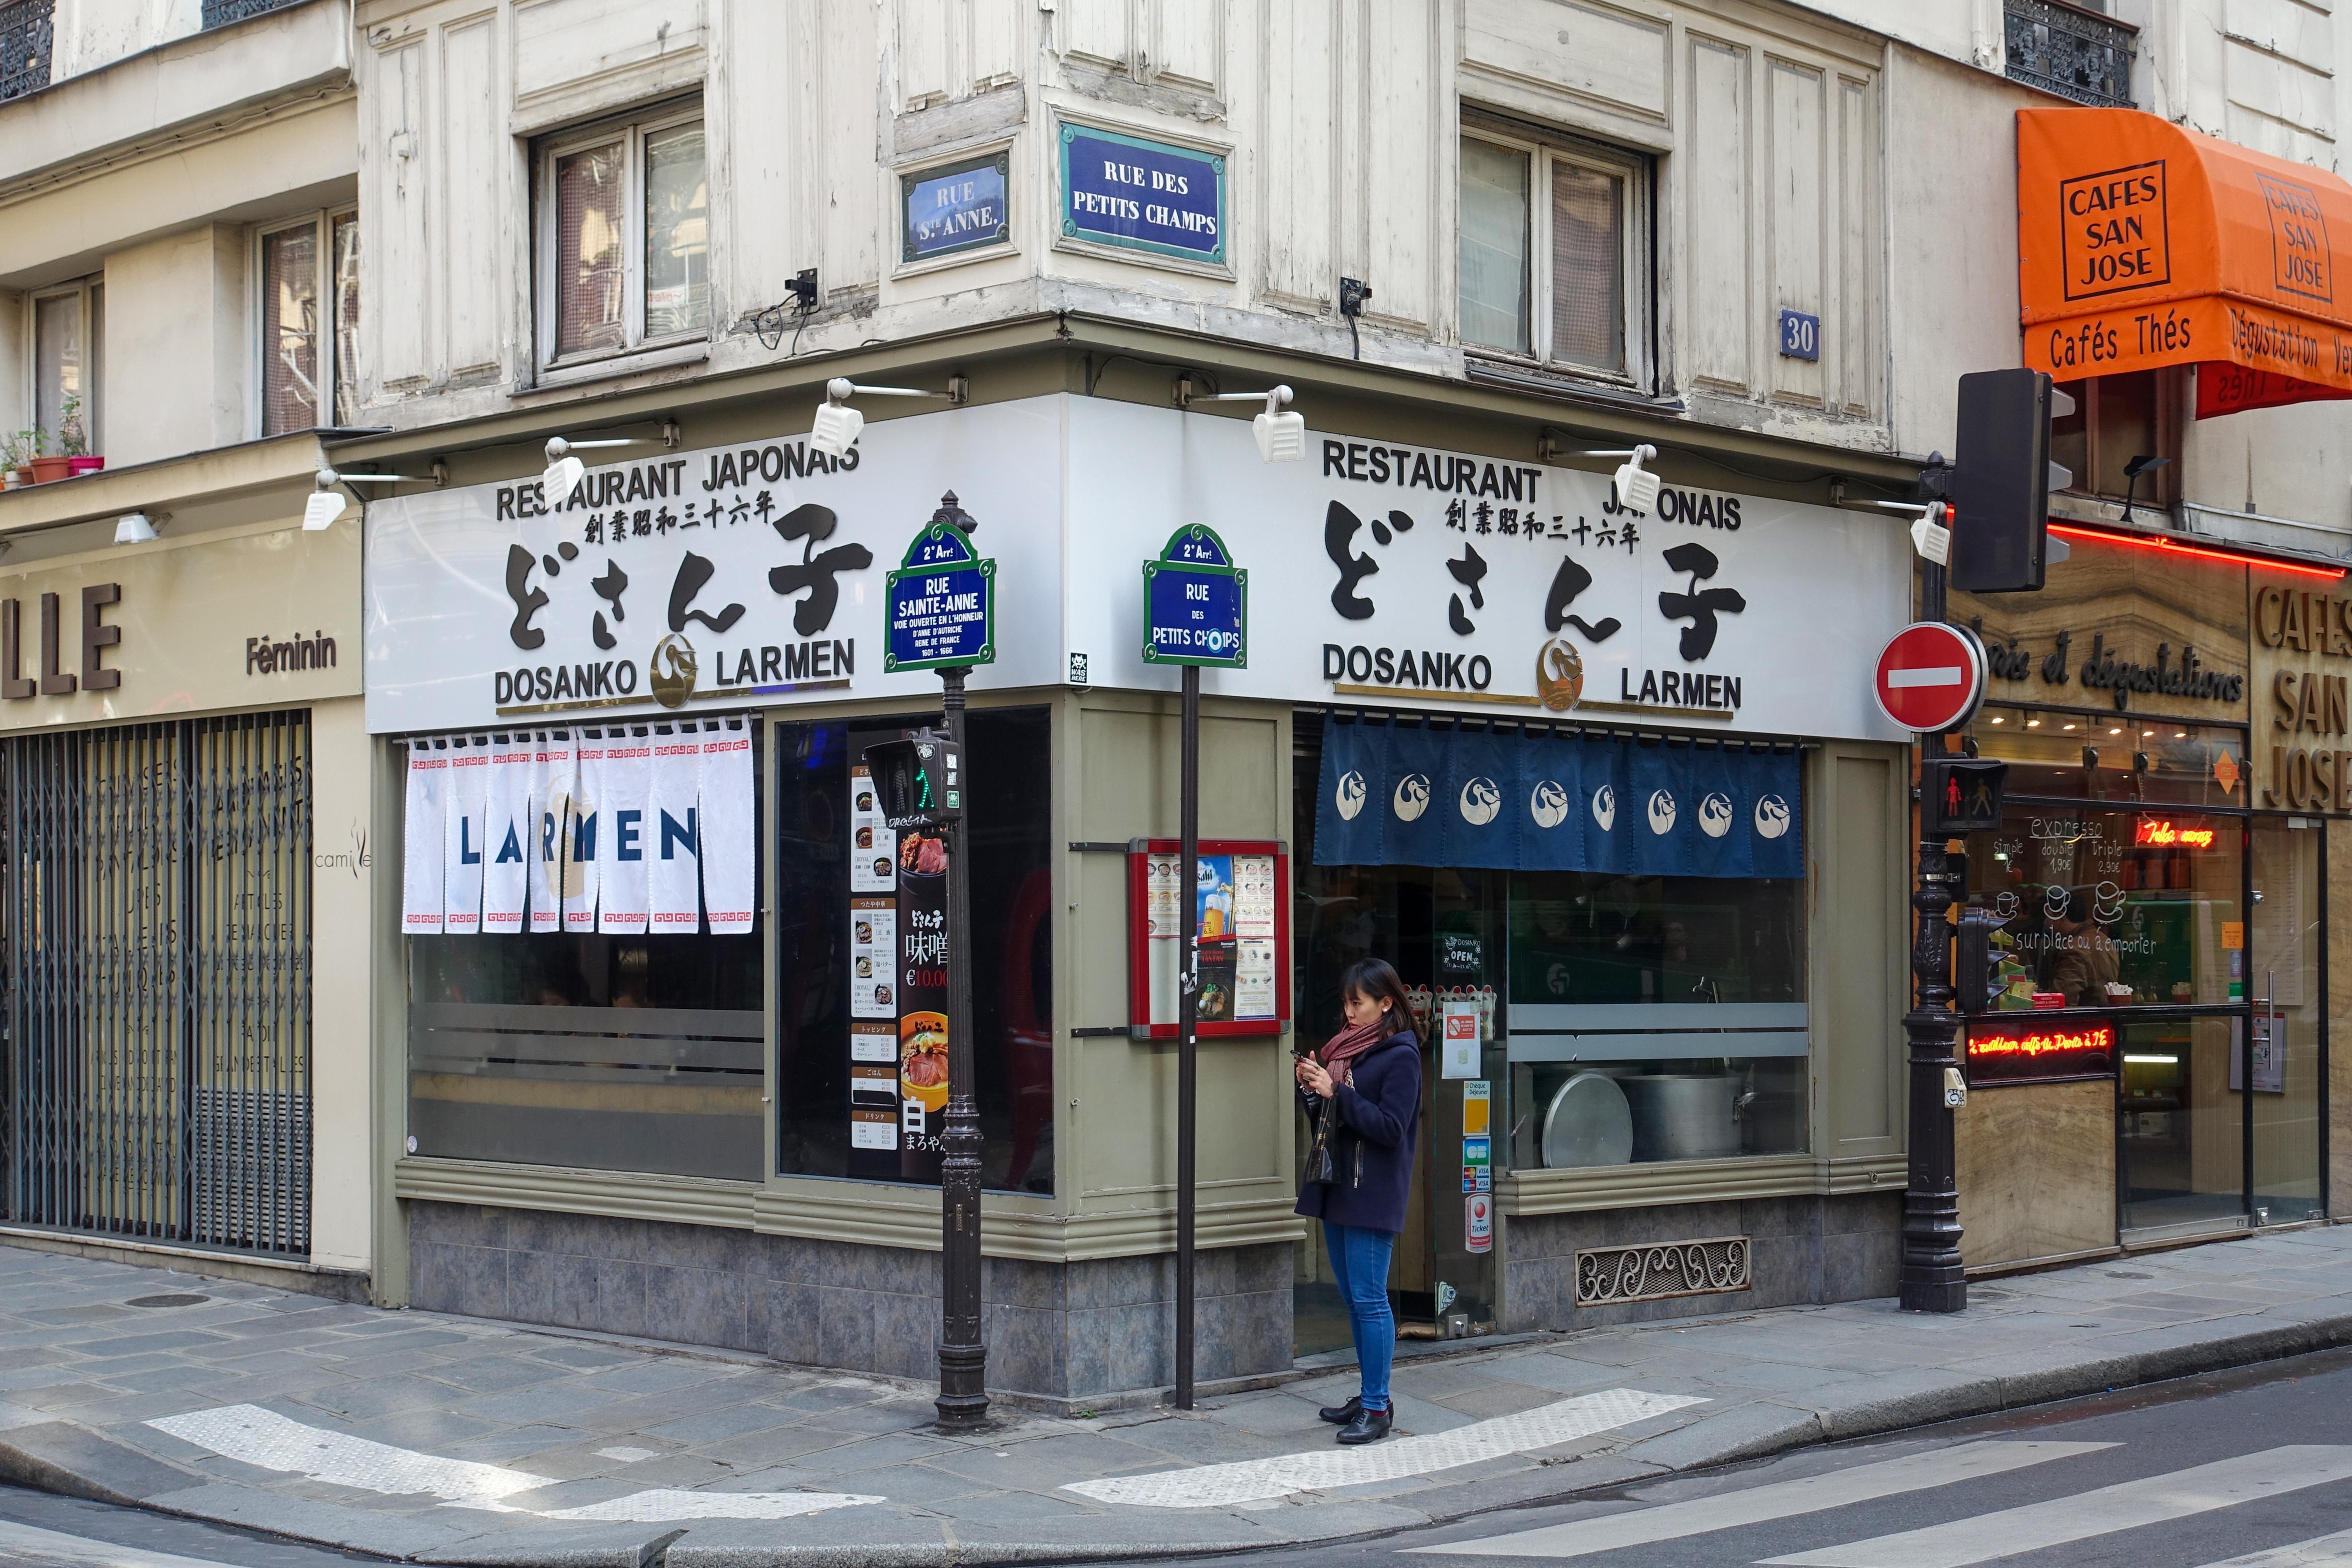 Restaurant Francais Paris